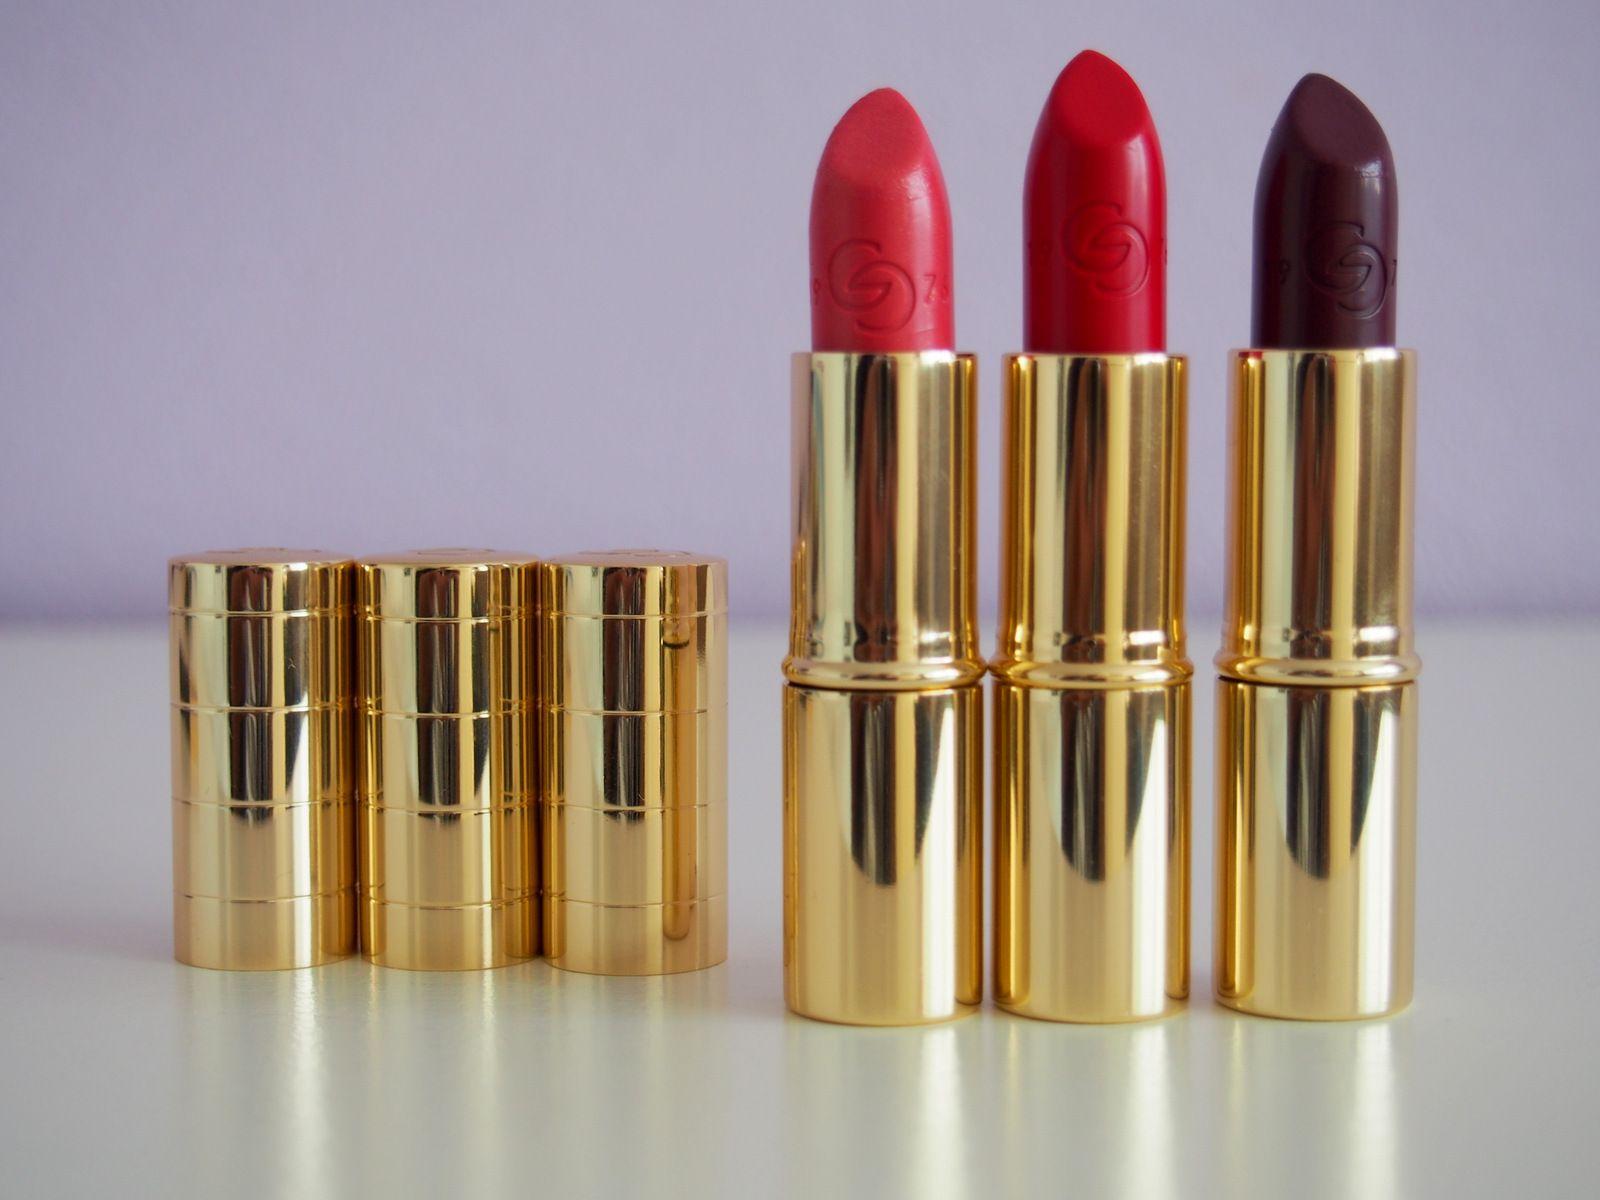 Giordani Gold Iconic Heritage Makeup Beauty Hacks Beauty Und Makeup